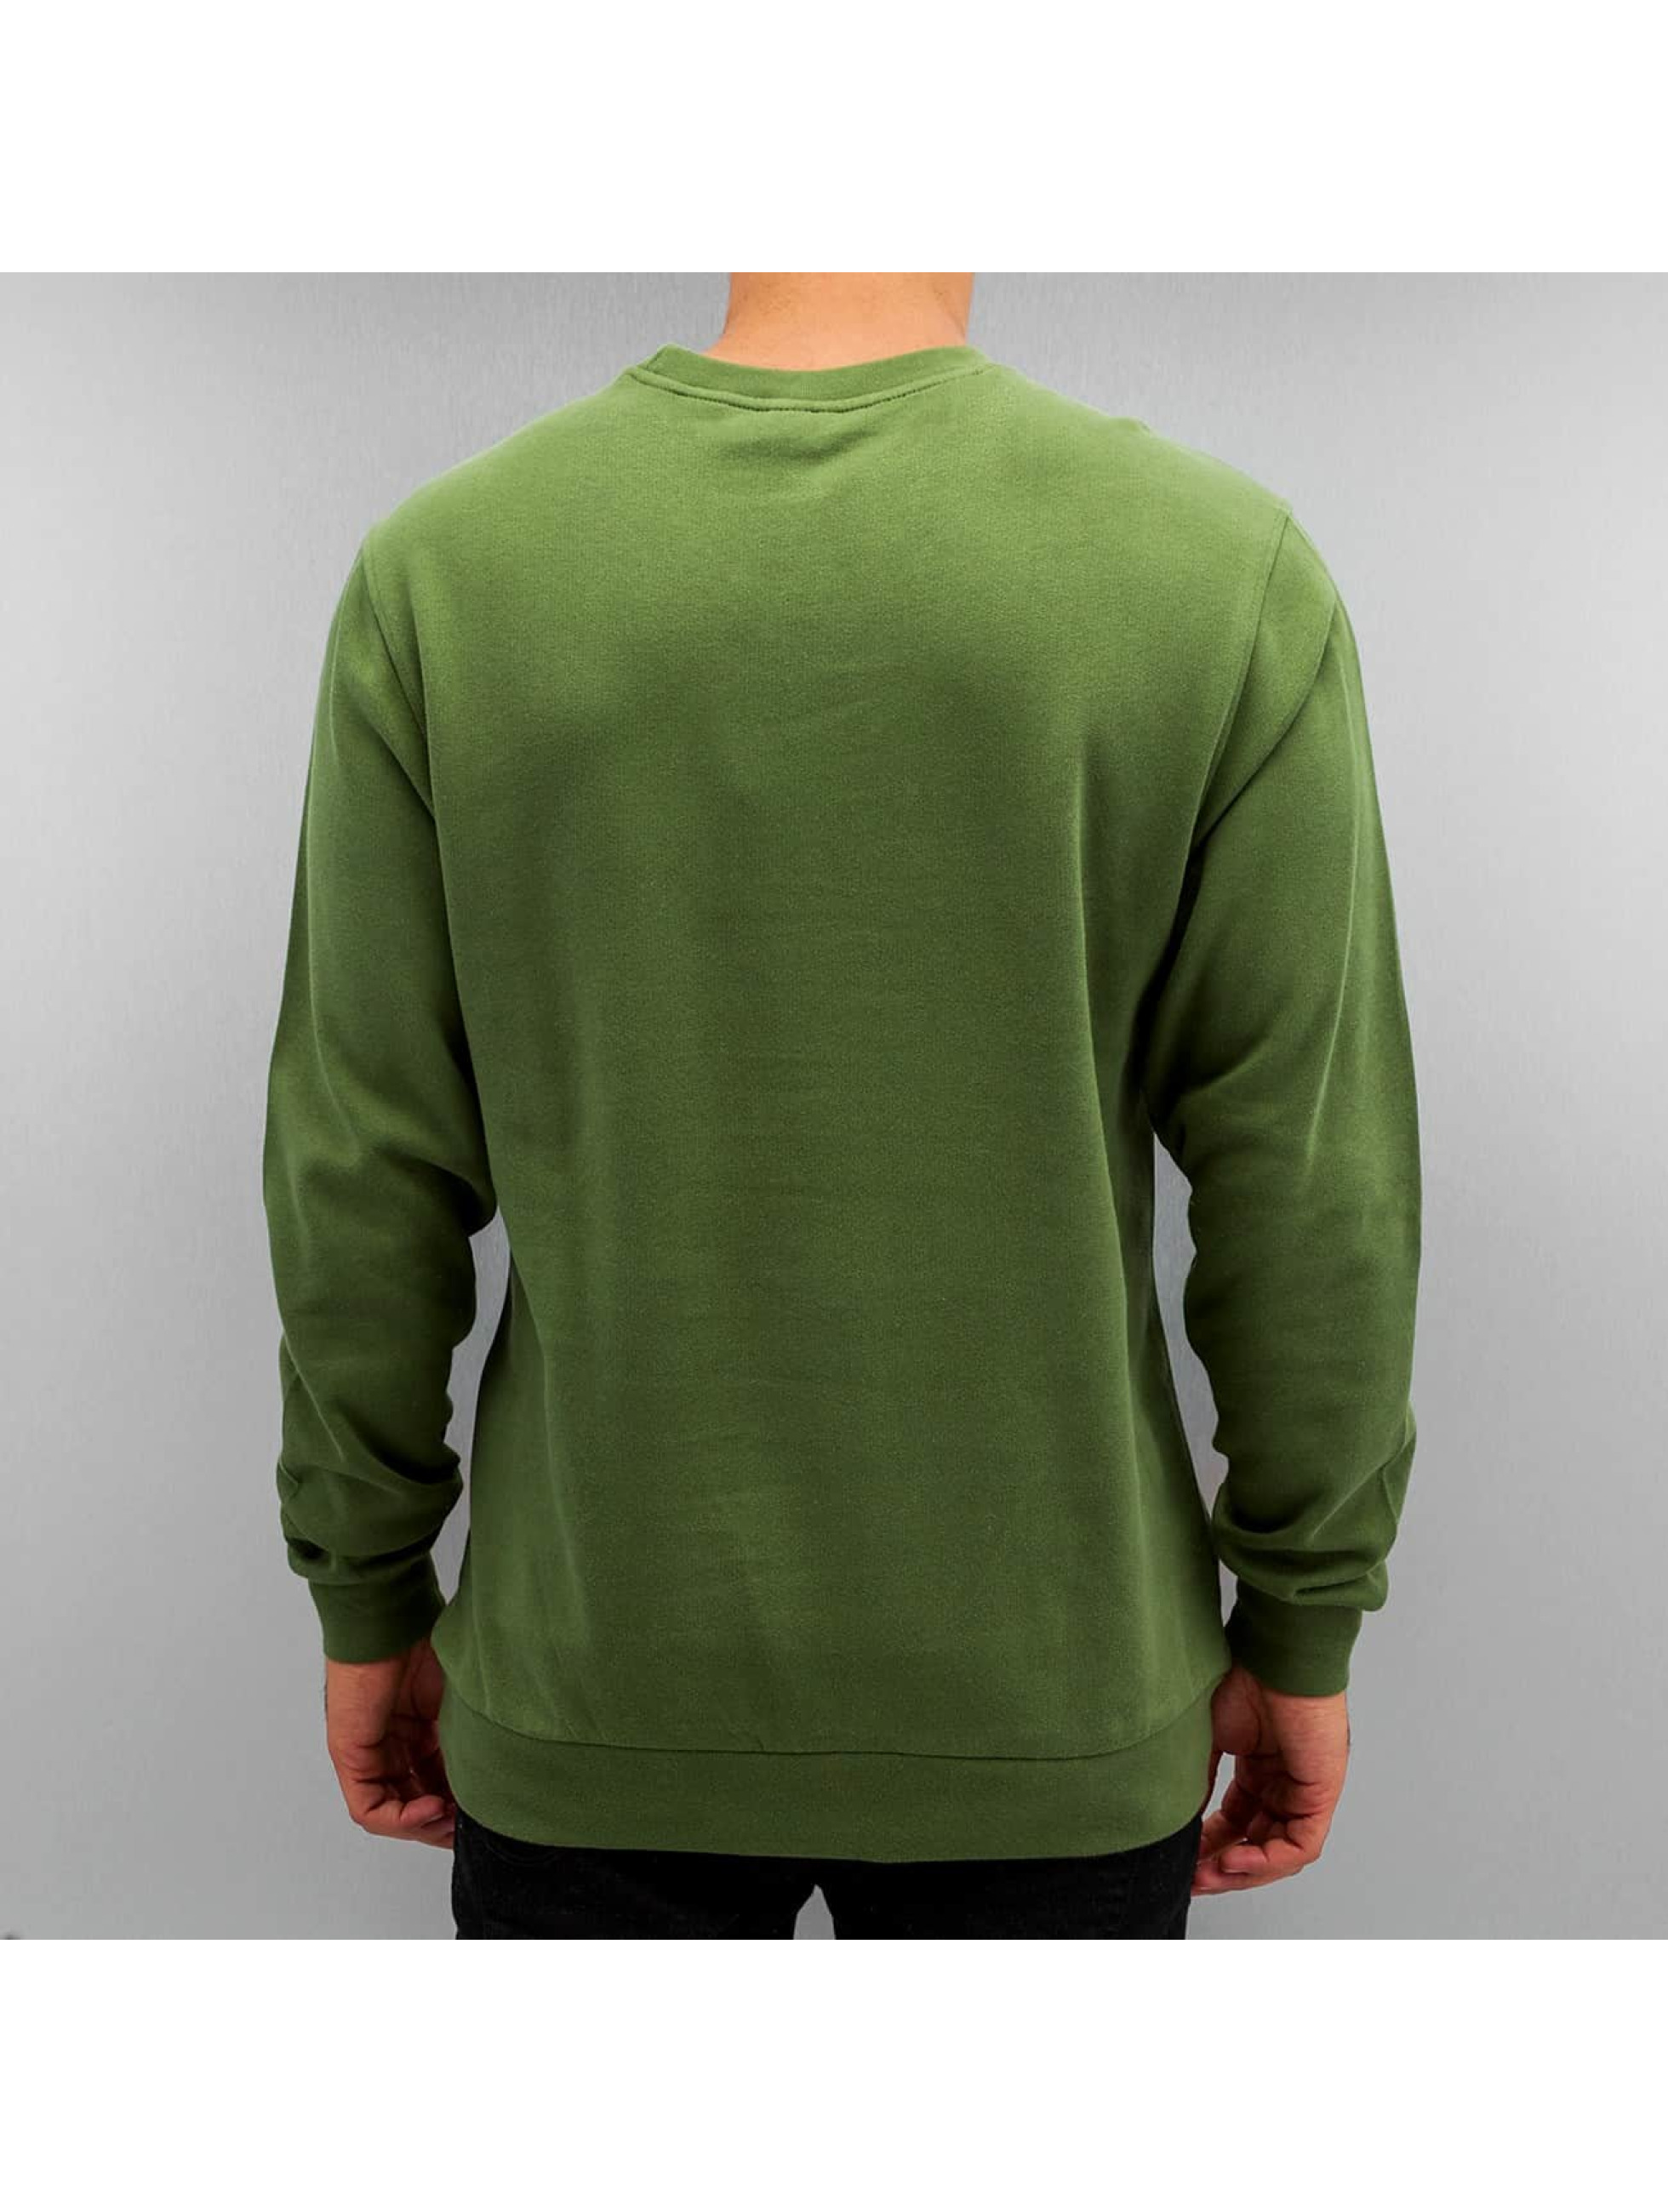 Pelle Pelle Swetry Back 2 The Basics zielony